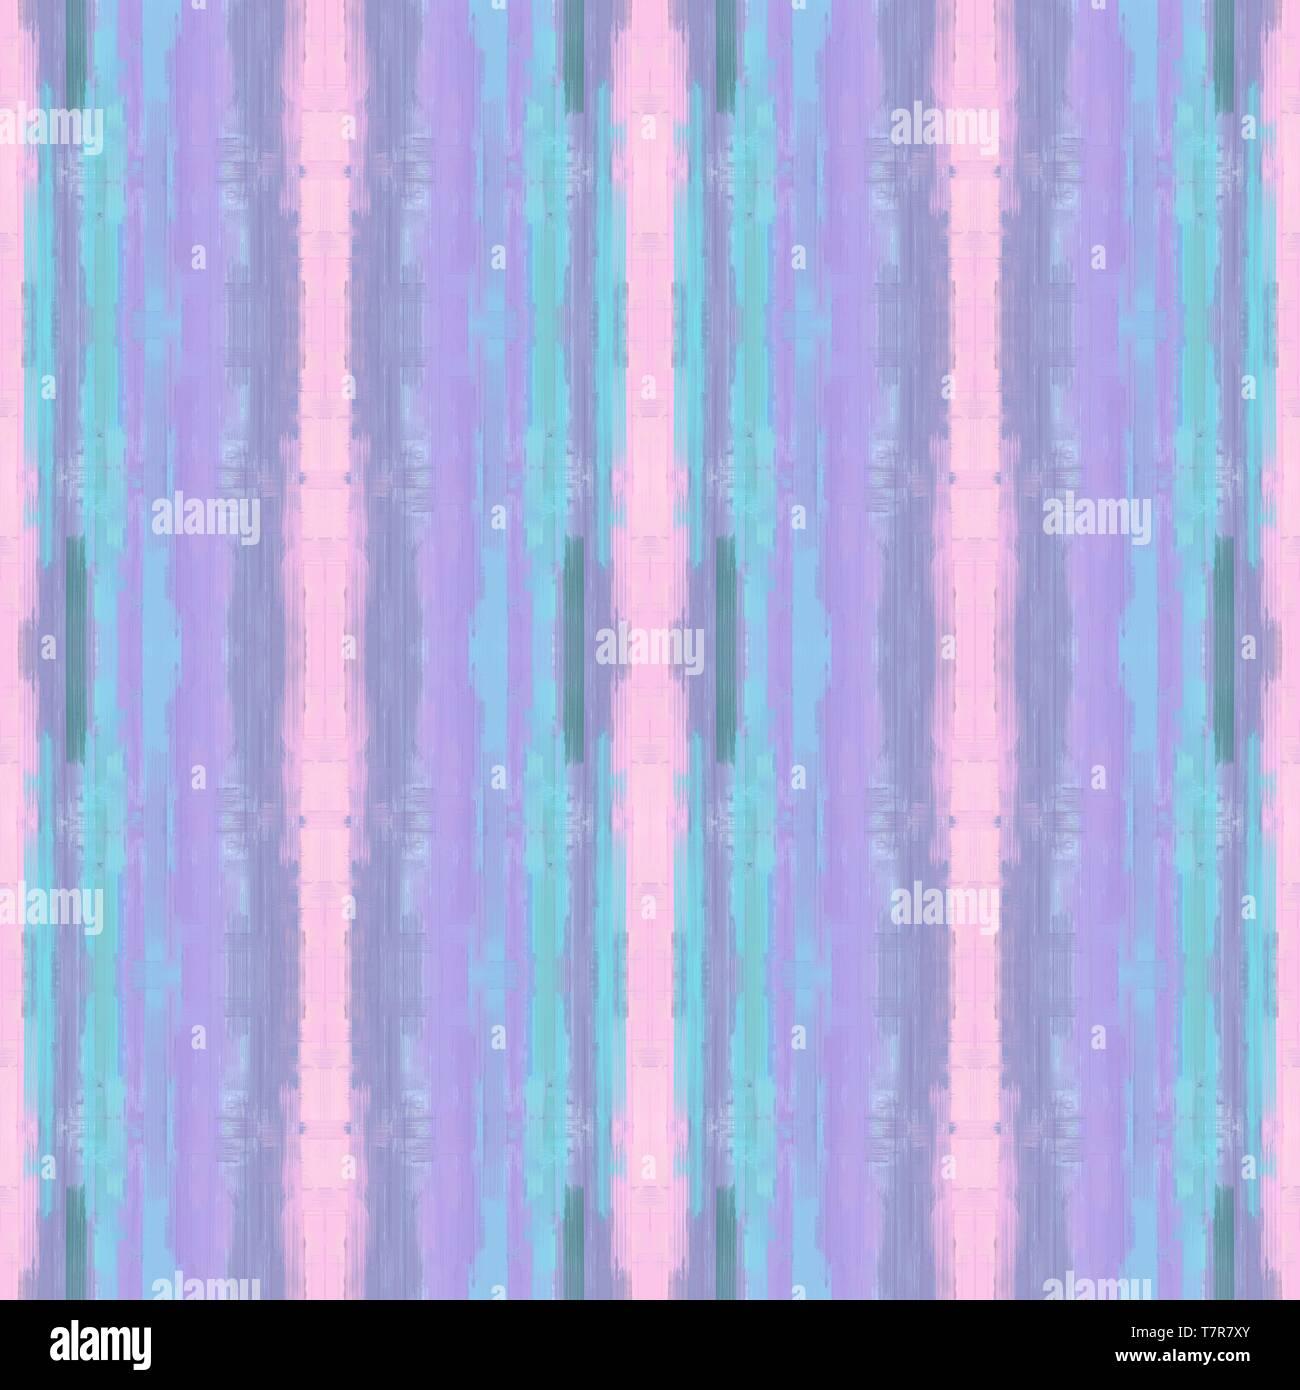 Seamless Brushed Painting Pattern With Light Pastel Purple Pastel